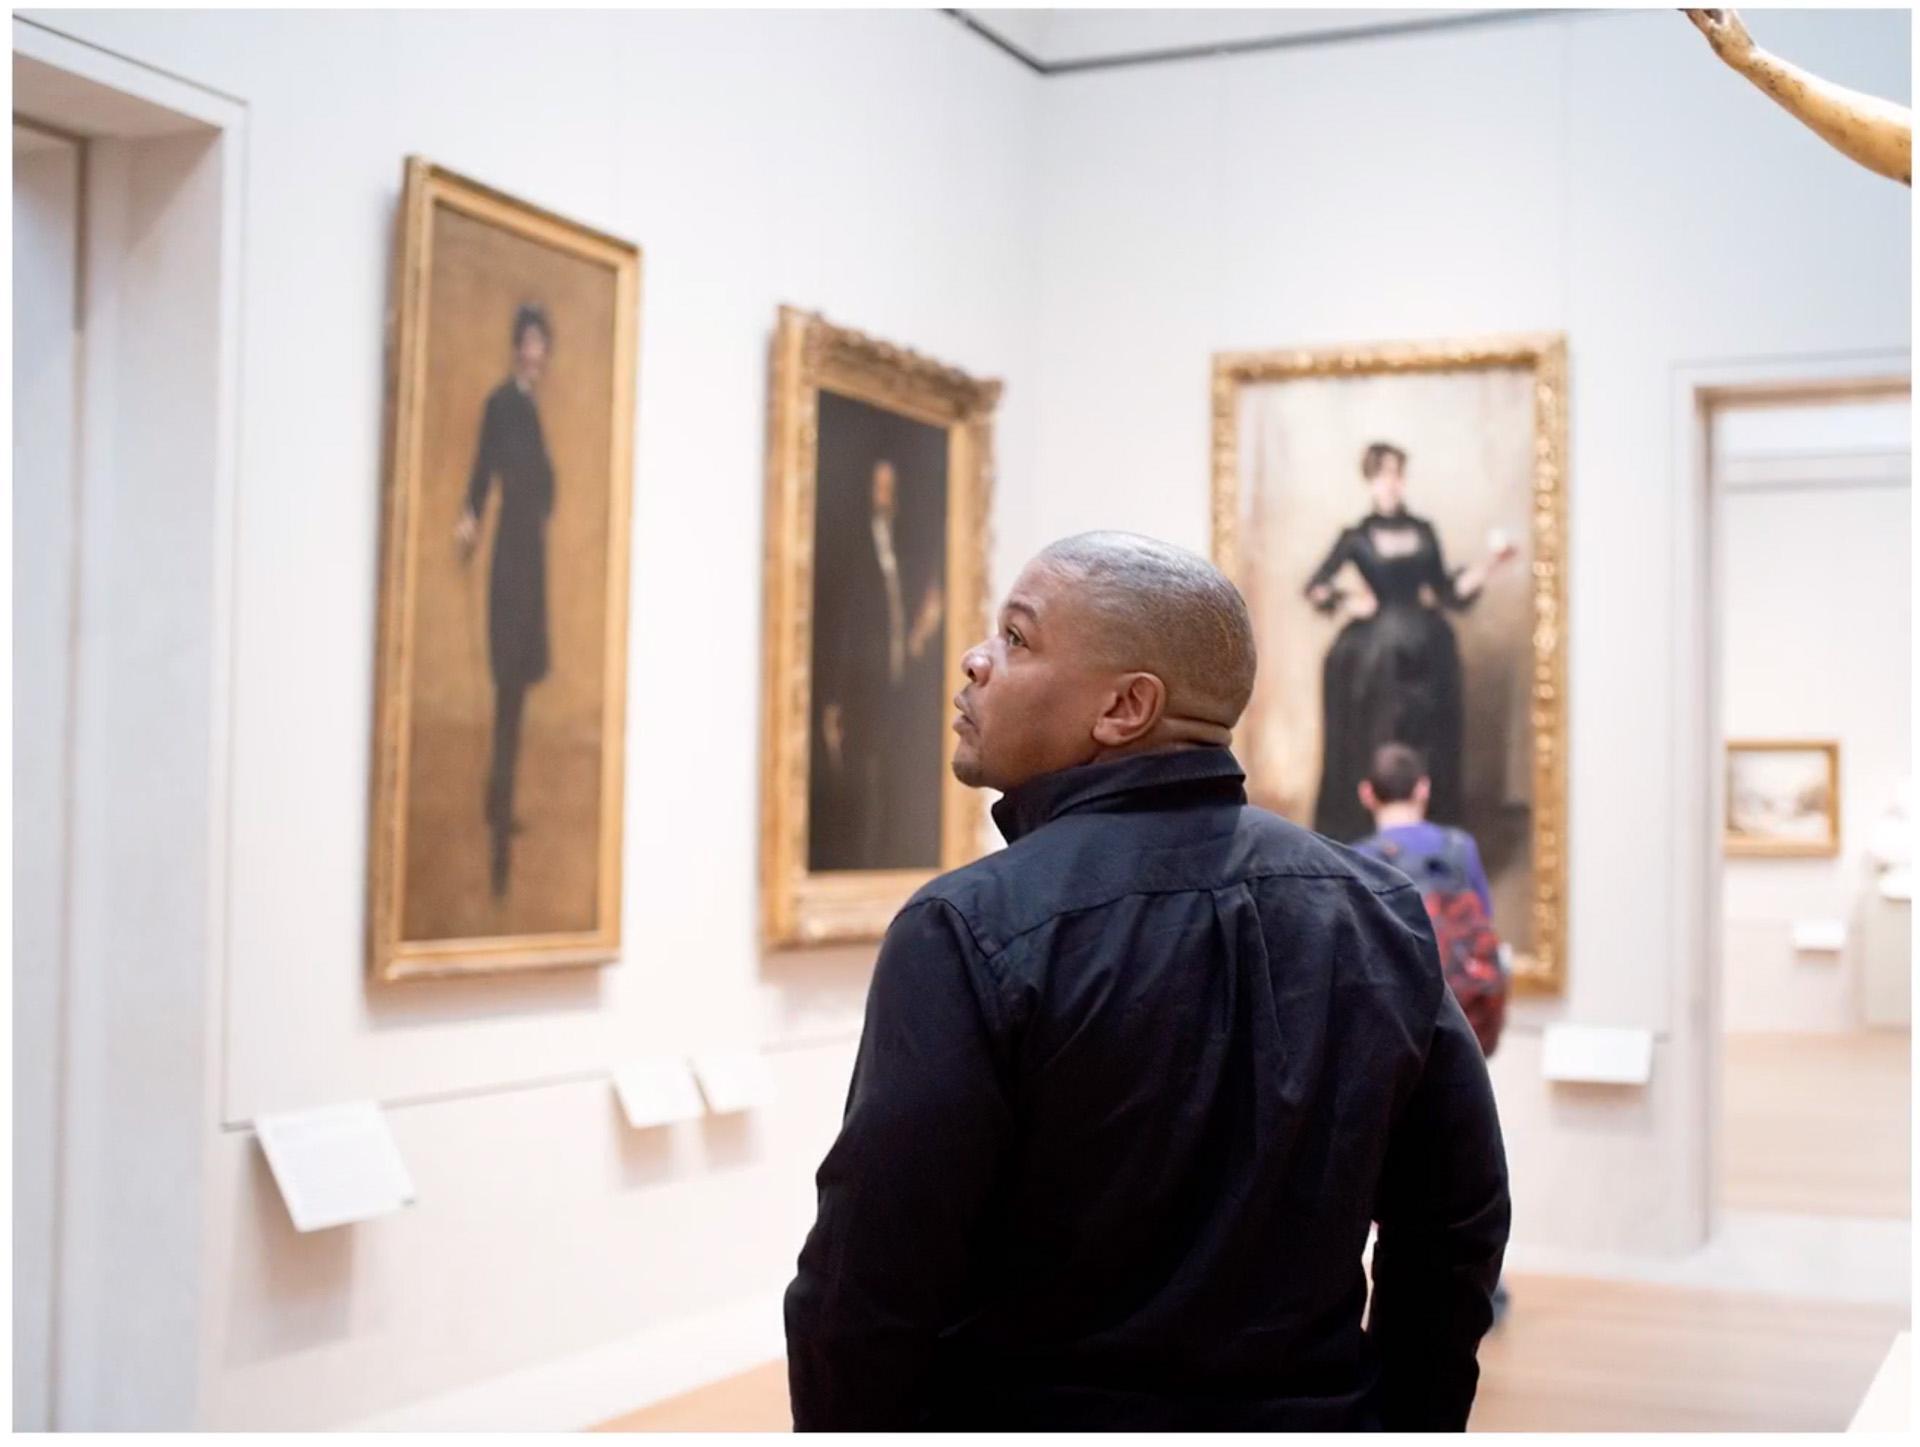 L'artiste Kehinde Wiley à propos des oeuvres de John Singer Sargent.